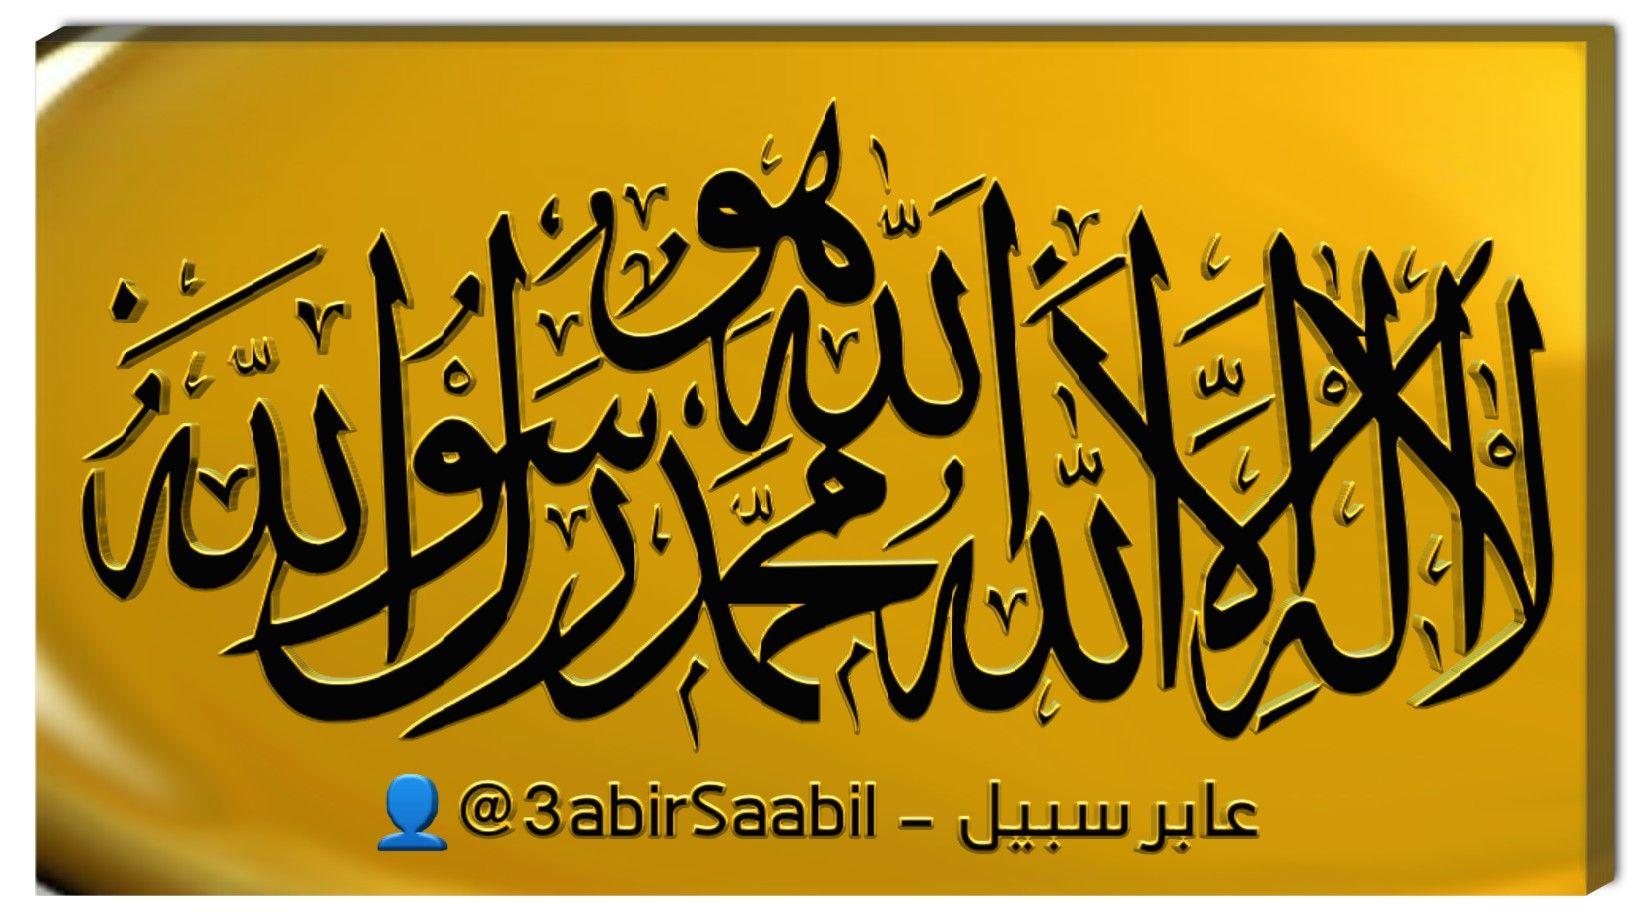 غلاف فيسبوك 3d إسلامي تصميمي عابرسبيل Arabic Calligraphy Jamal Calligraphy